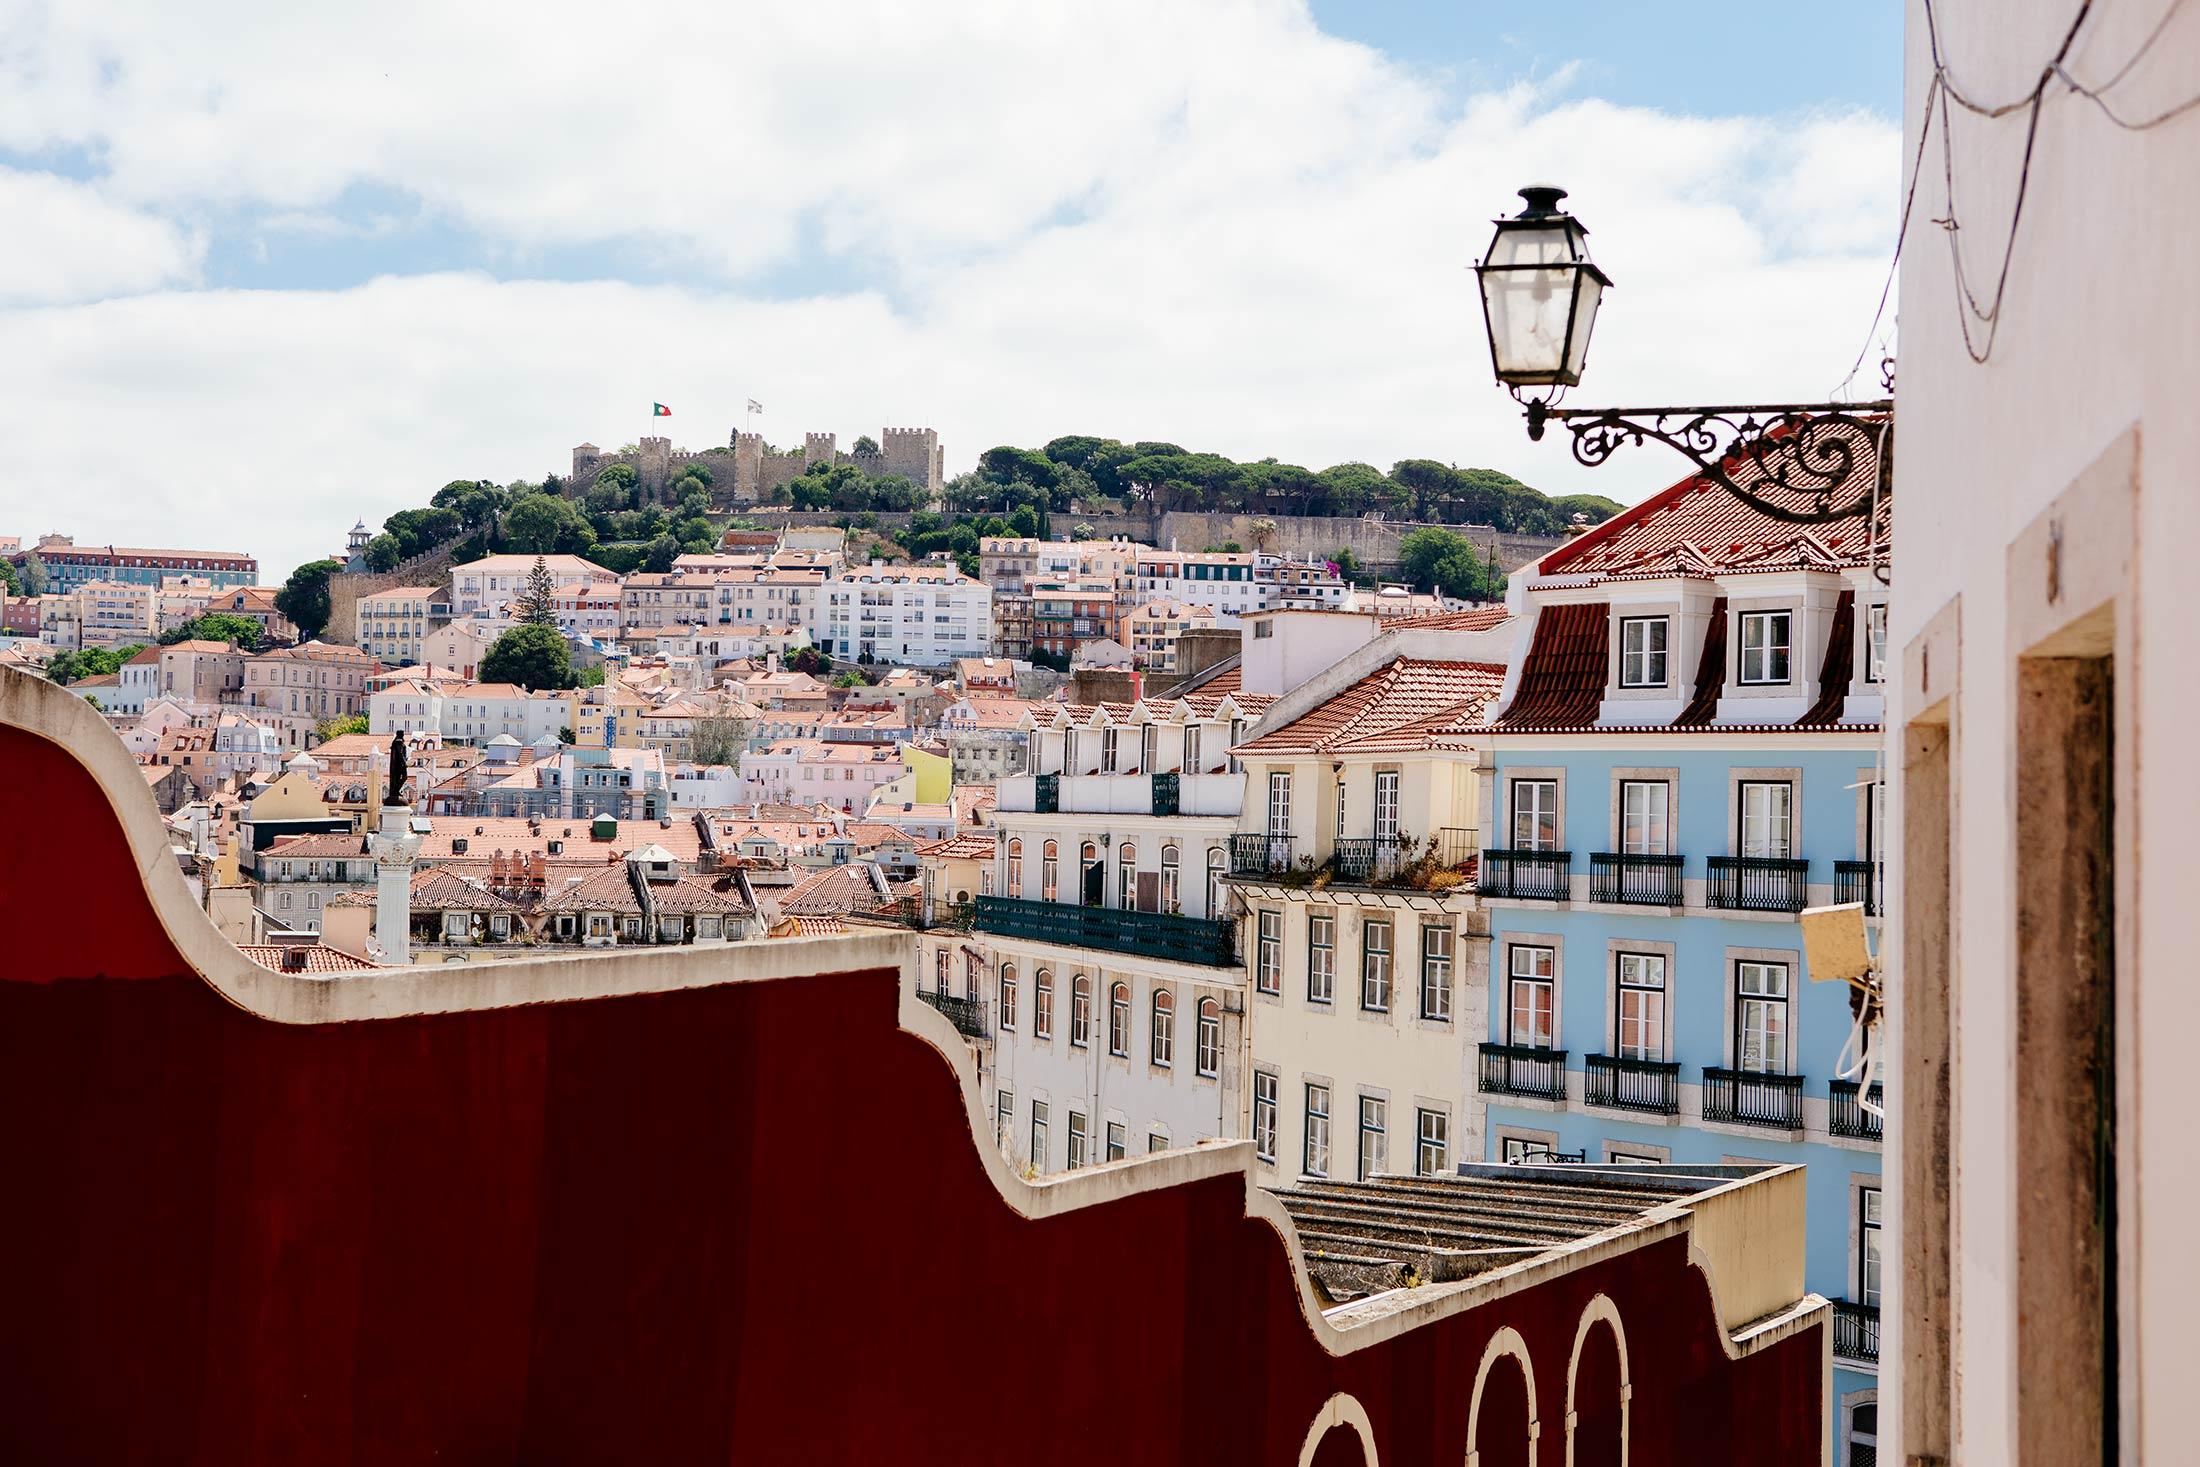 LIS_Lissabon_14-Mitja_Schneehage